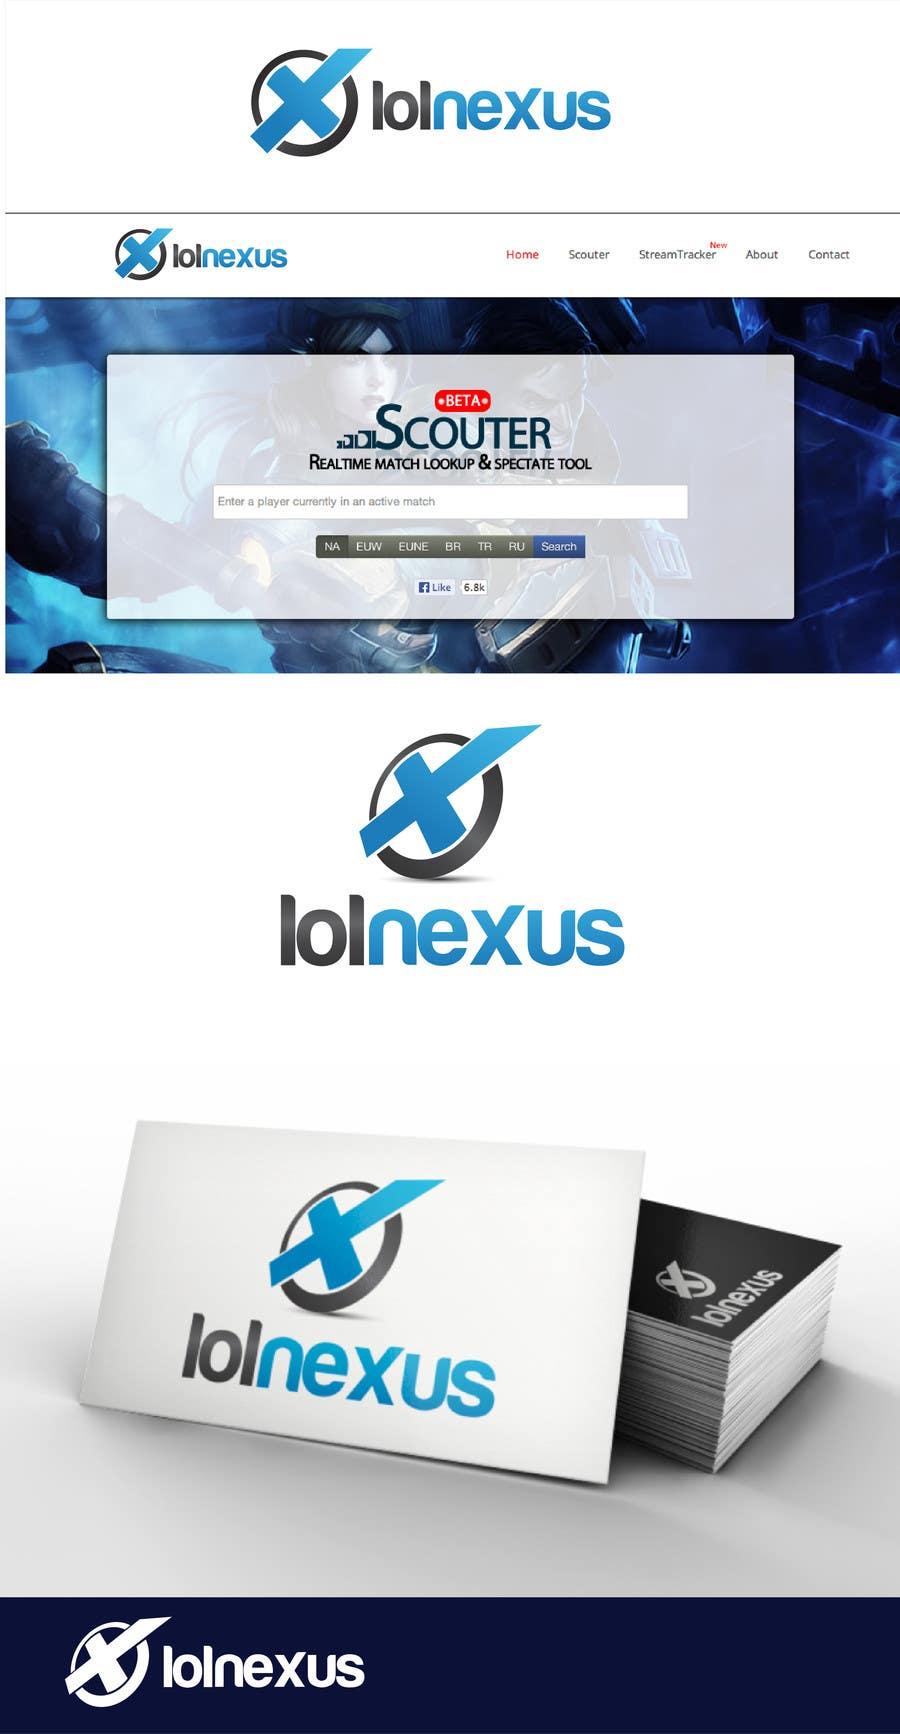 Bài tham dự cuộc thi #                                        54                                      cho                                         Design a logo to fit with site design